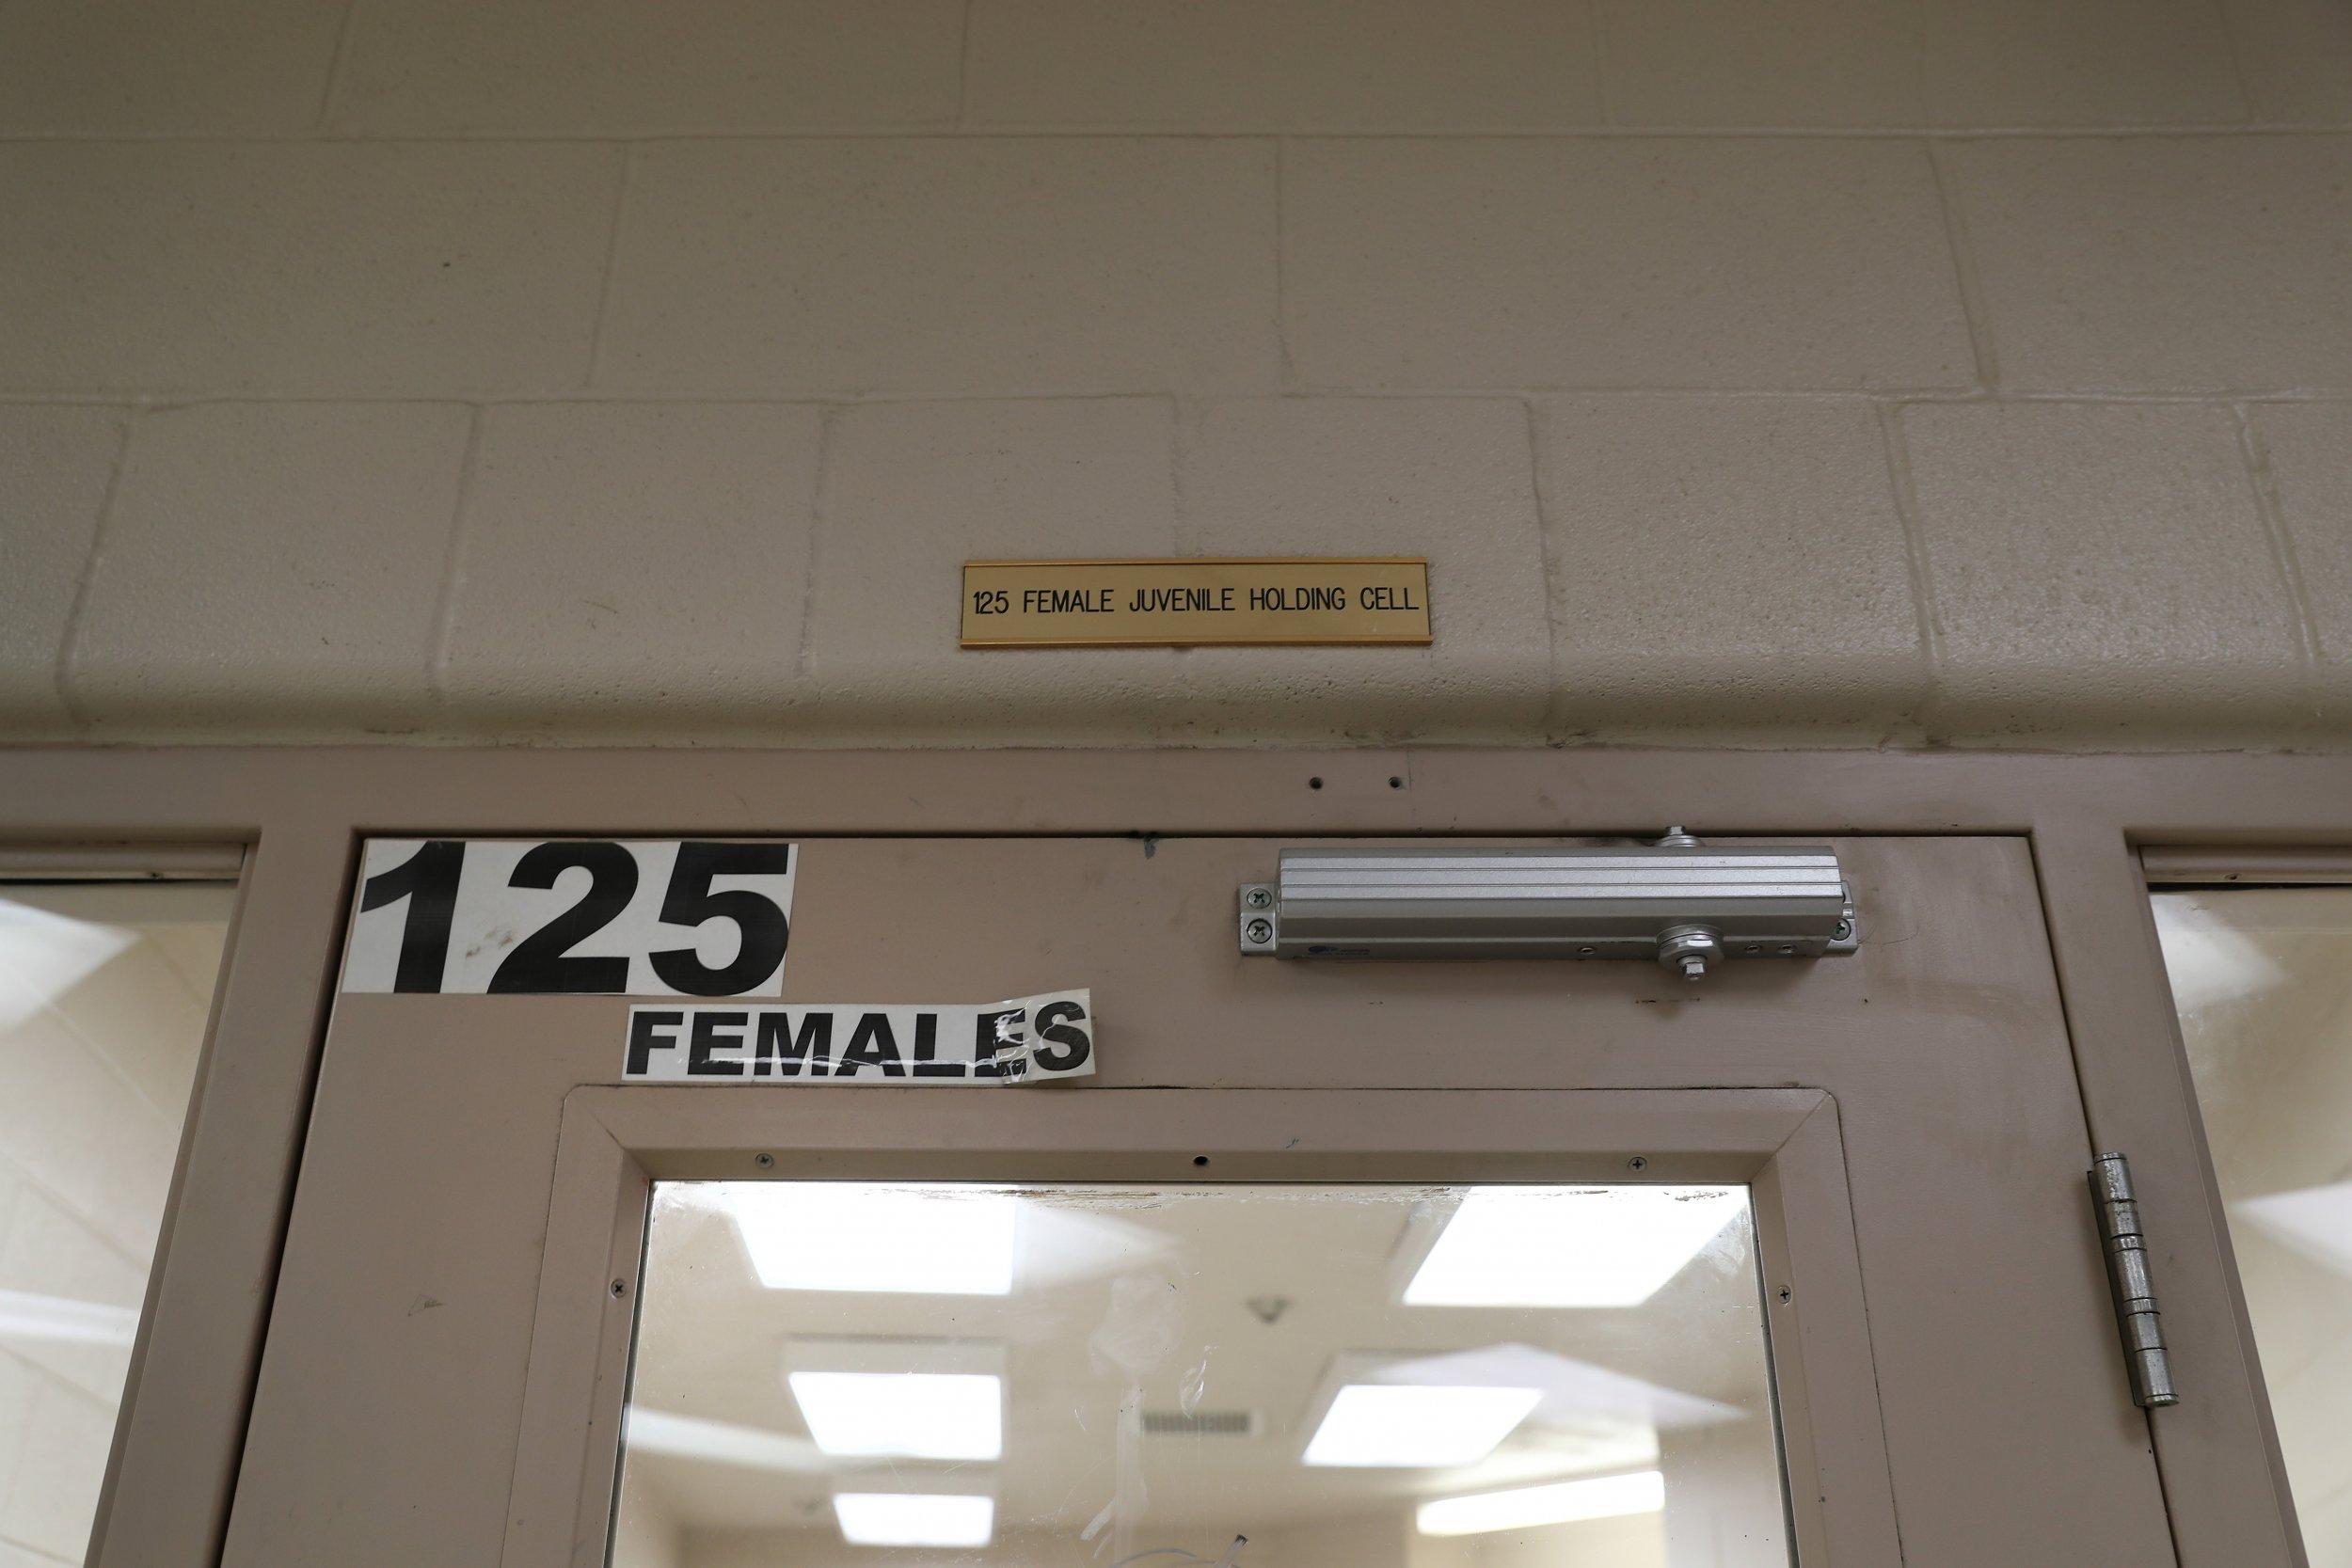 Immigrant-Detention-Center